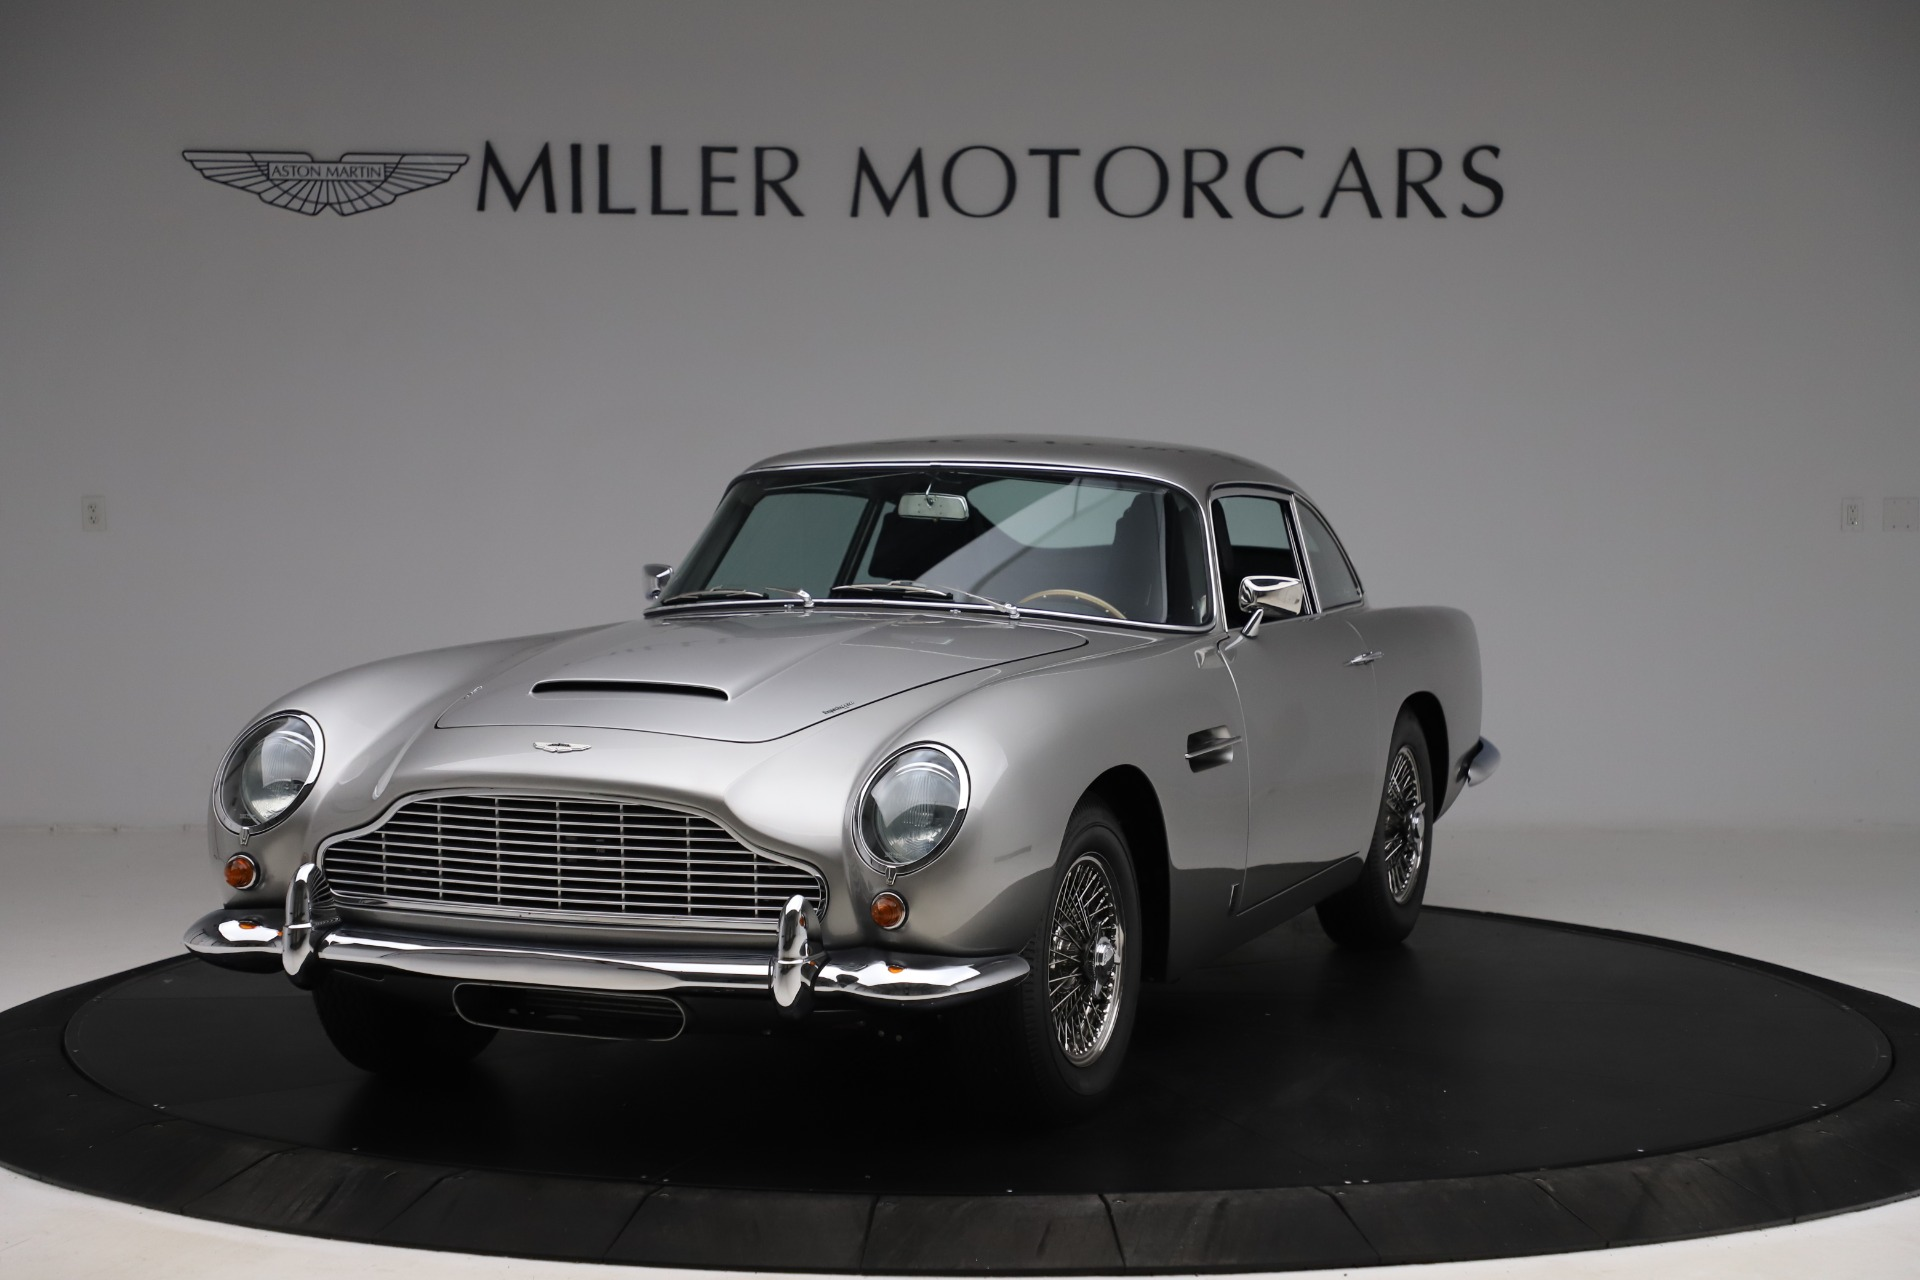 Pre Owned 1964 Aston Martin Db5 For Sale Miller Motorcars Stock 7797c